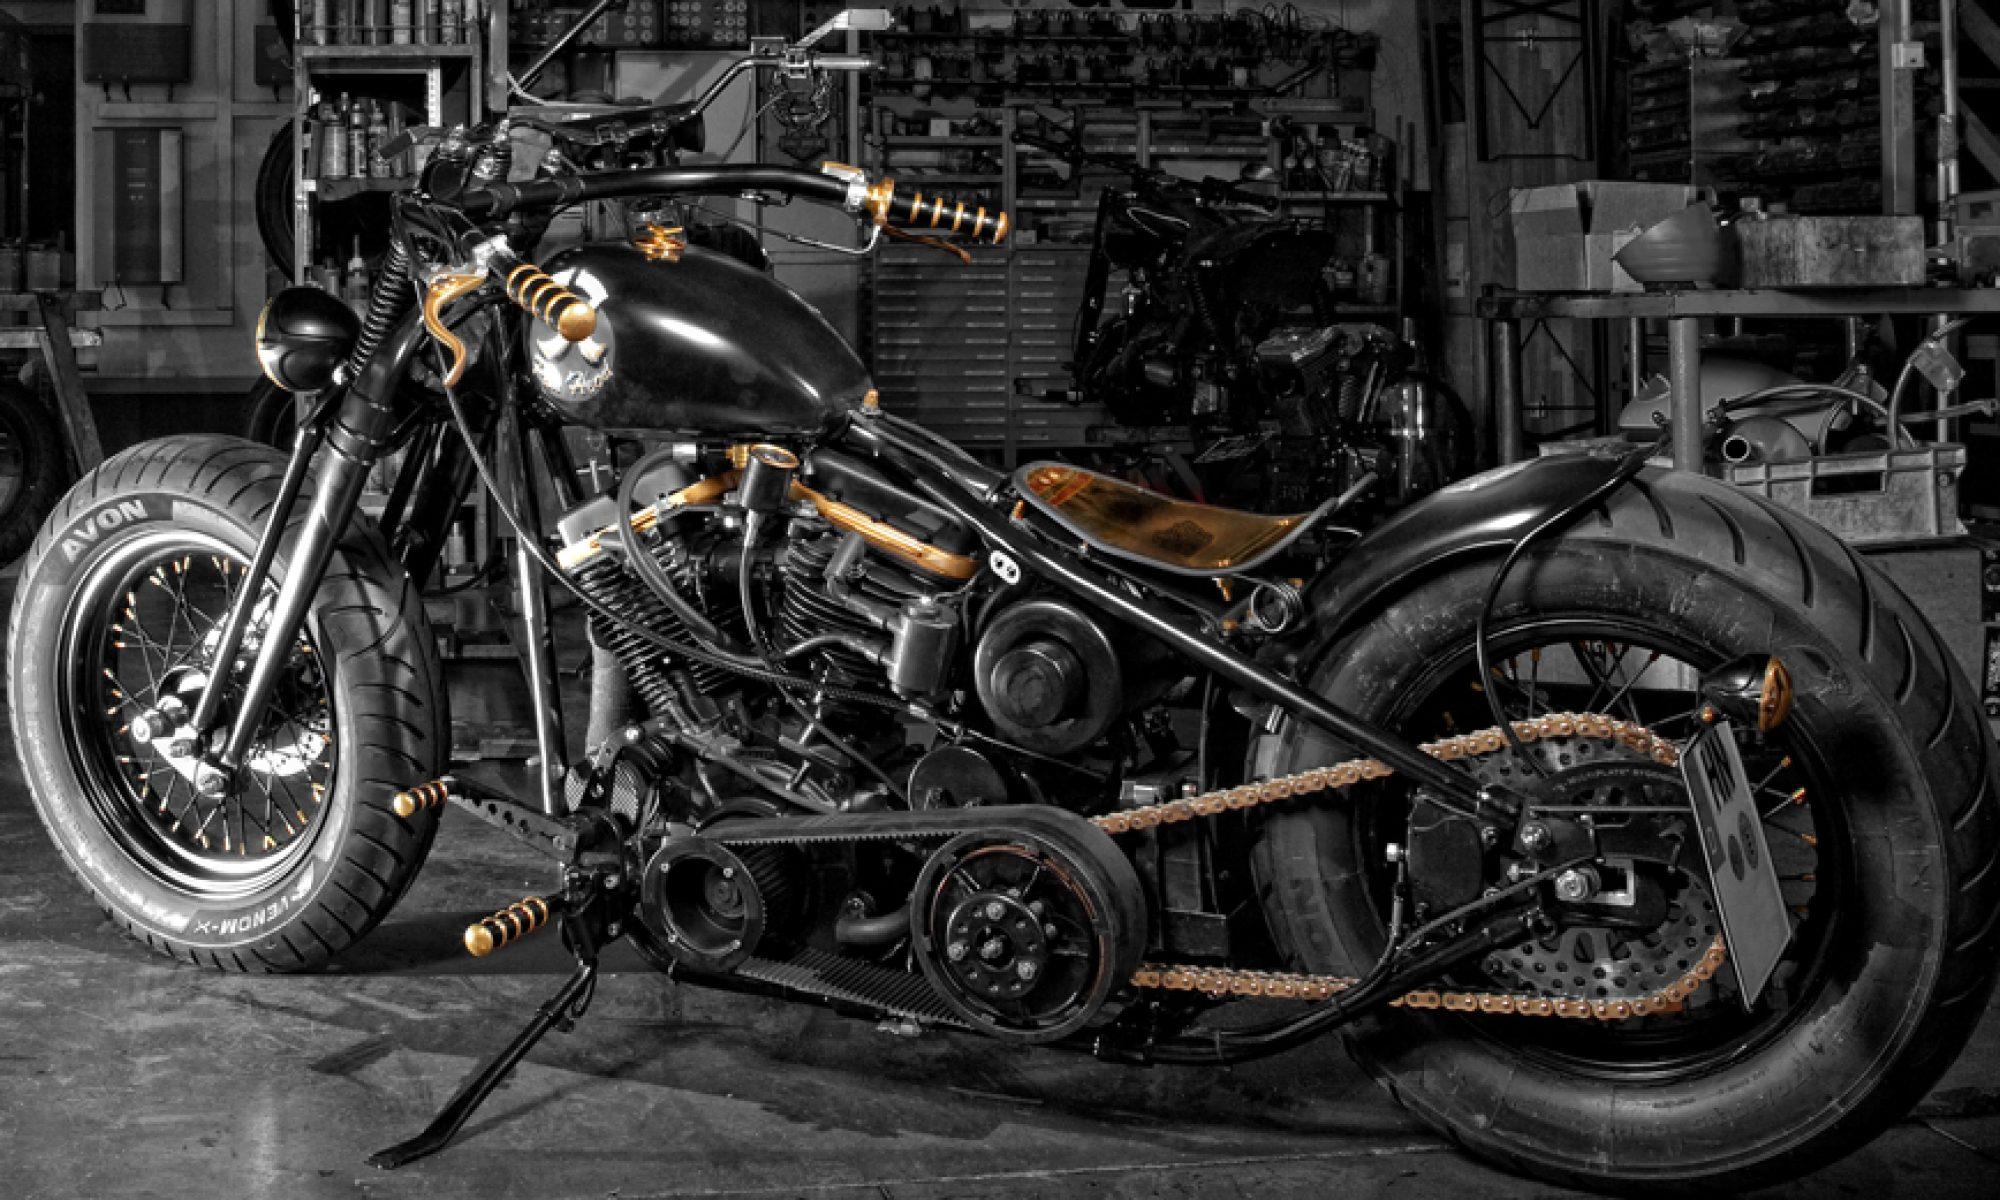 Hauser-Motorcycles